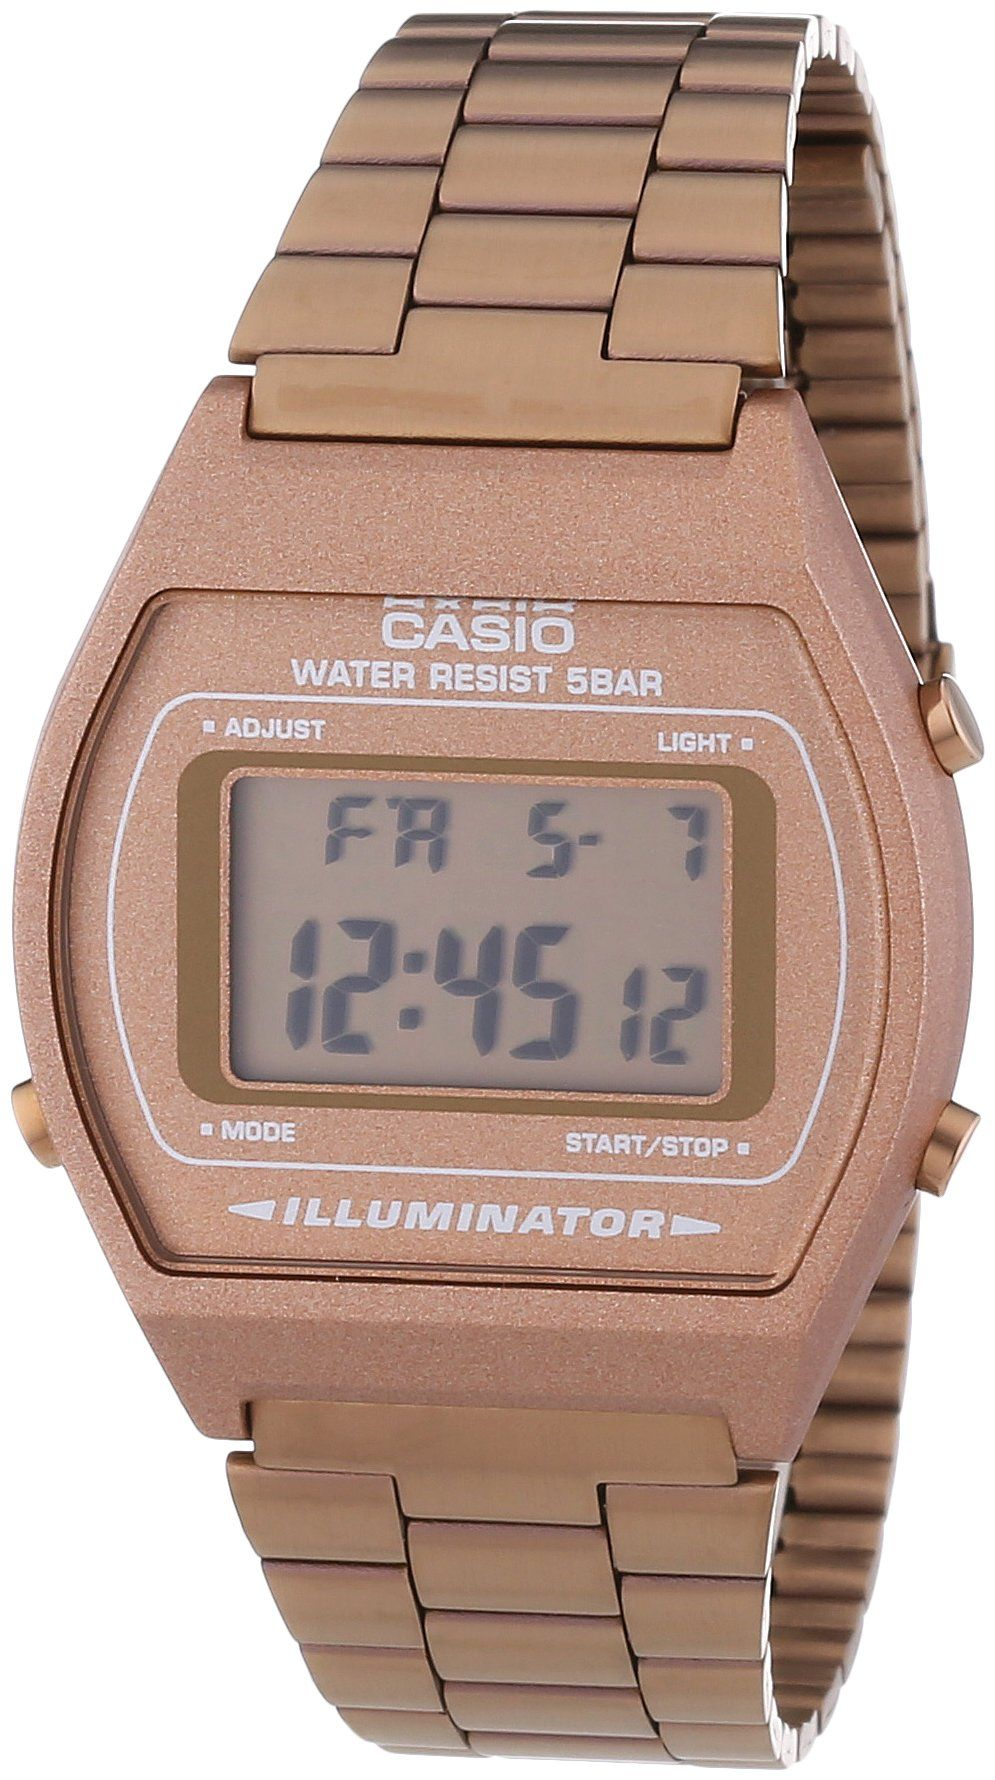 Casio Casio Collection B640WC-5AEF - Reloj digital de cuarzo unisex ... 7d2be6882da9